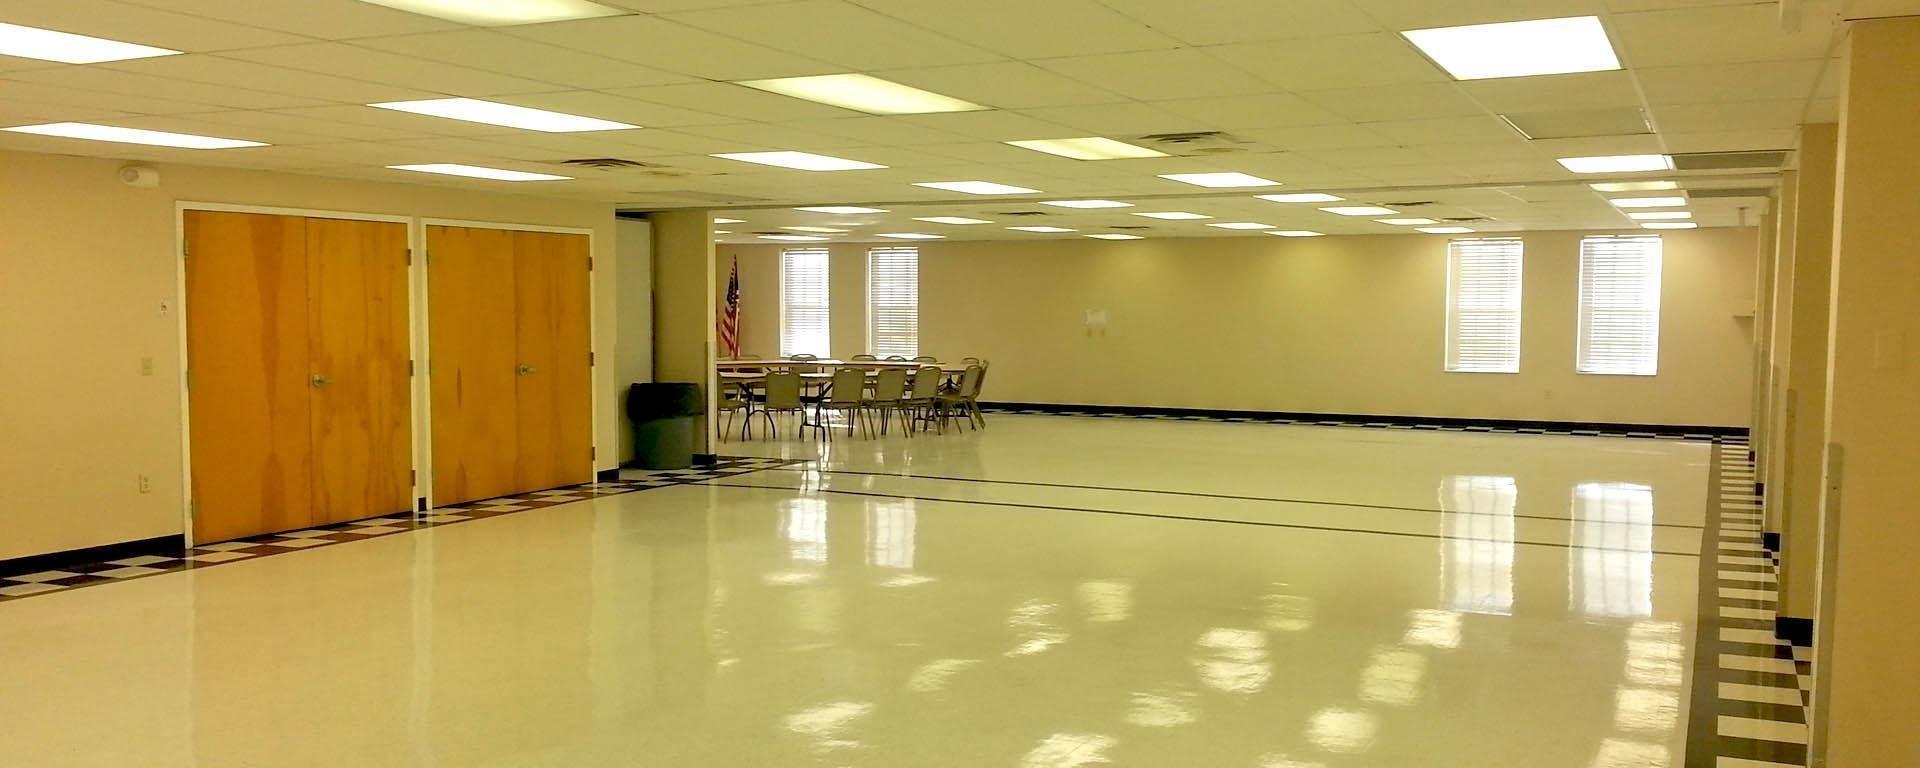 Palm City Community Center Martin County Florida